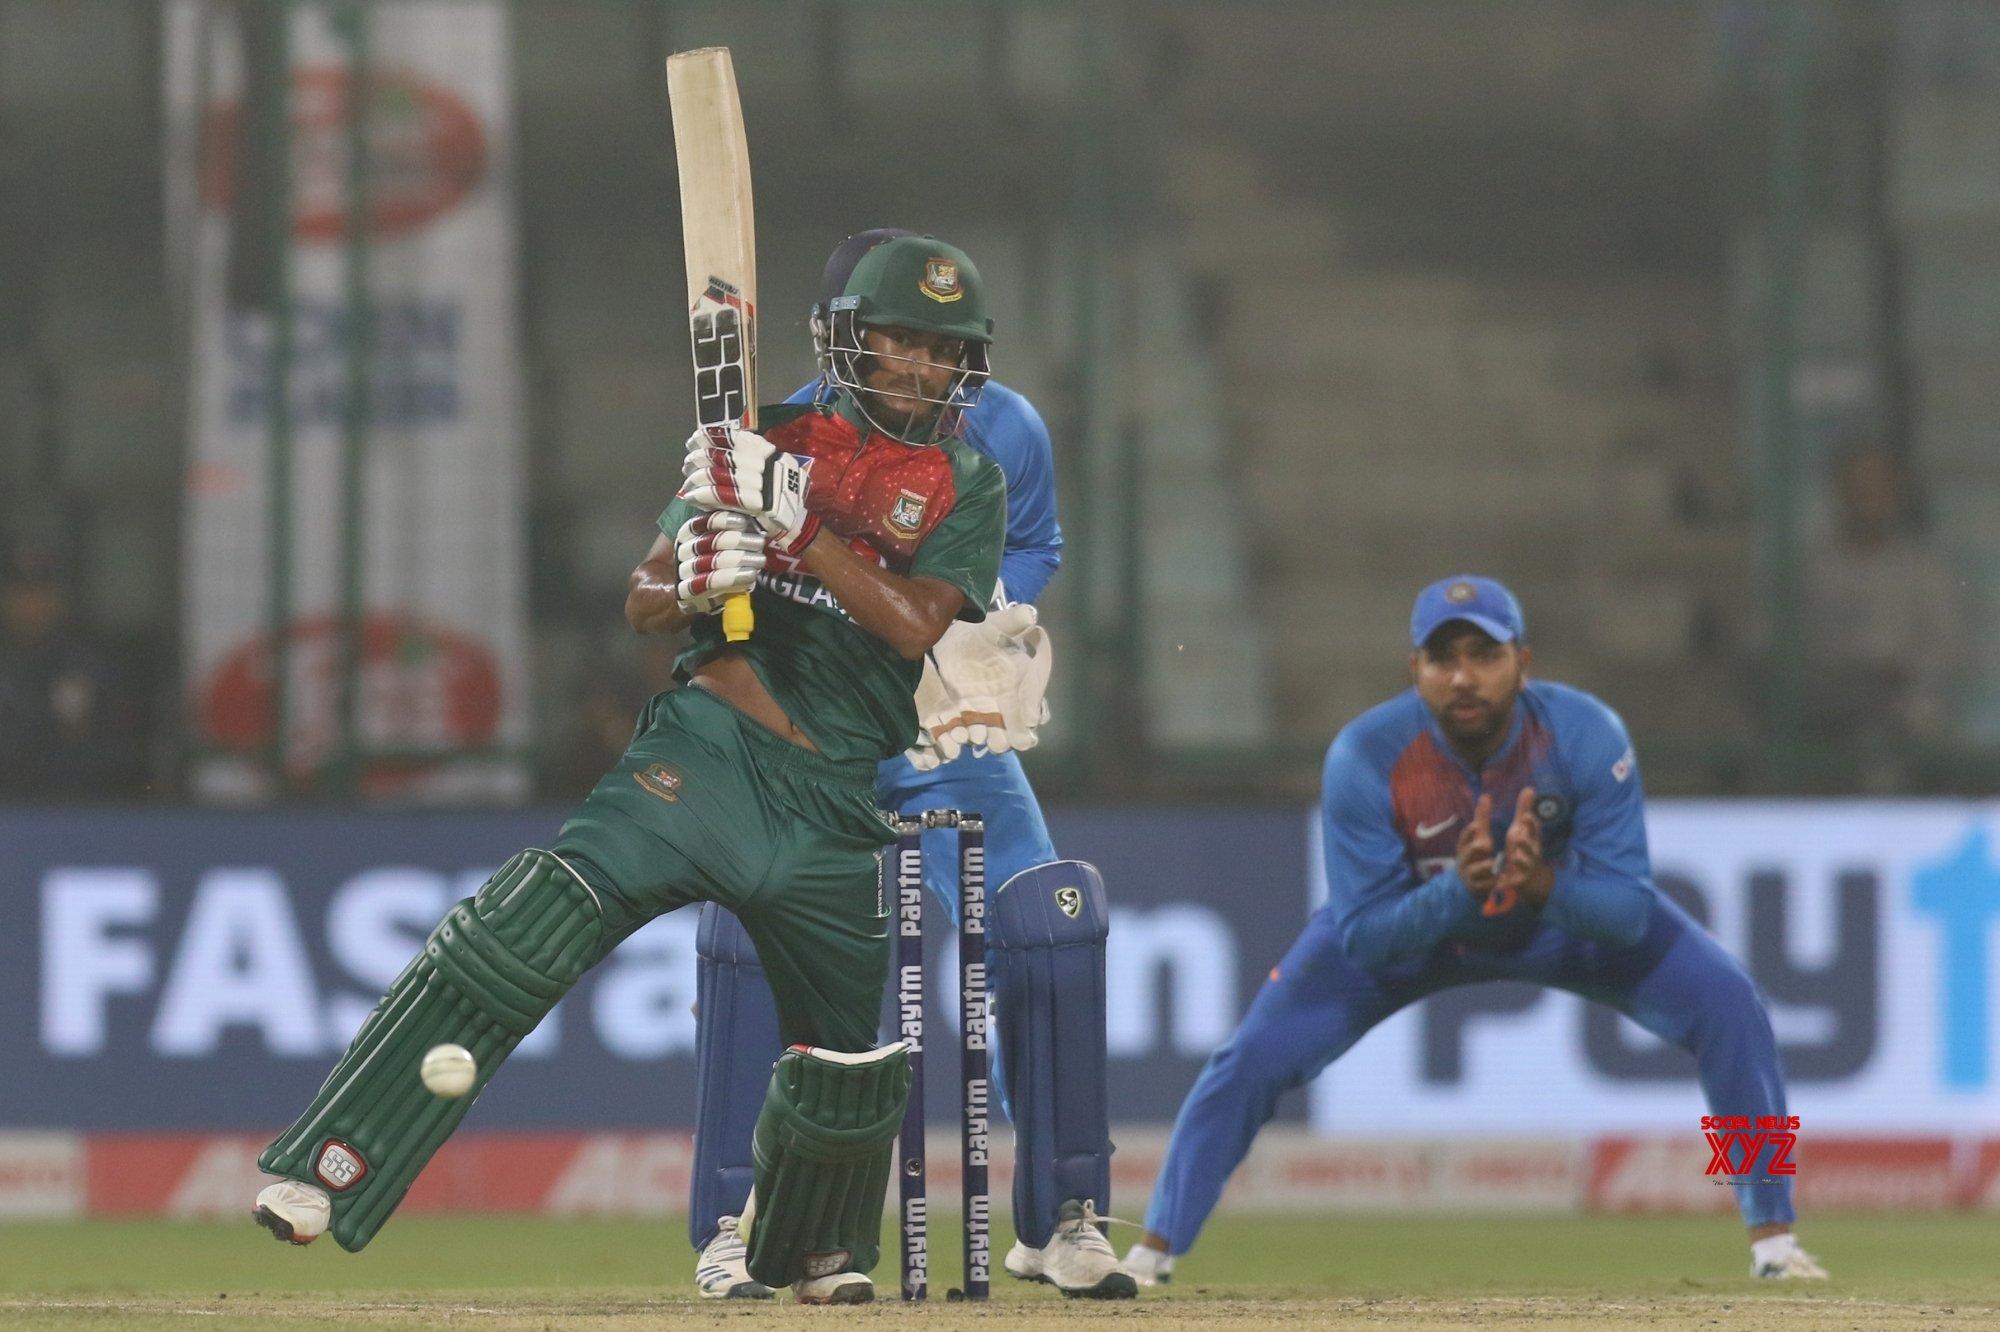 New Delhi: 1st T20I - India Vs Bangladesh (Batch - 17) #Gallery